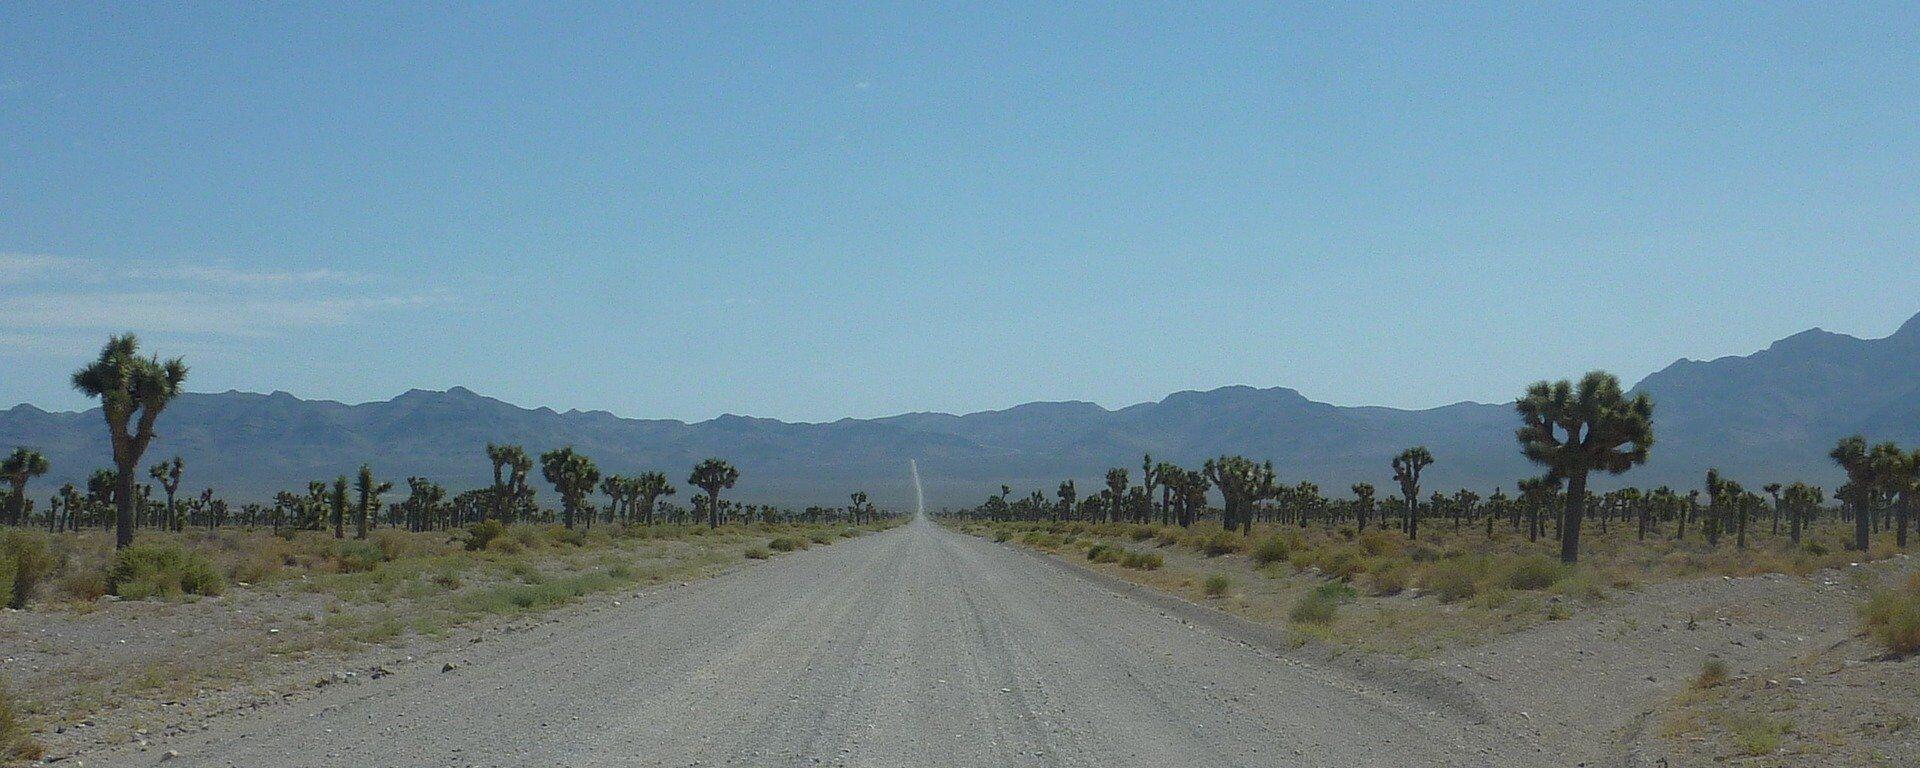 La carretera hacia el Área 51 - Sputnik Mundo, 1920, 11.03.2021